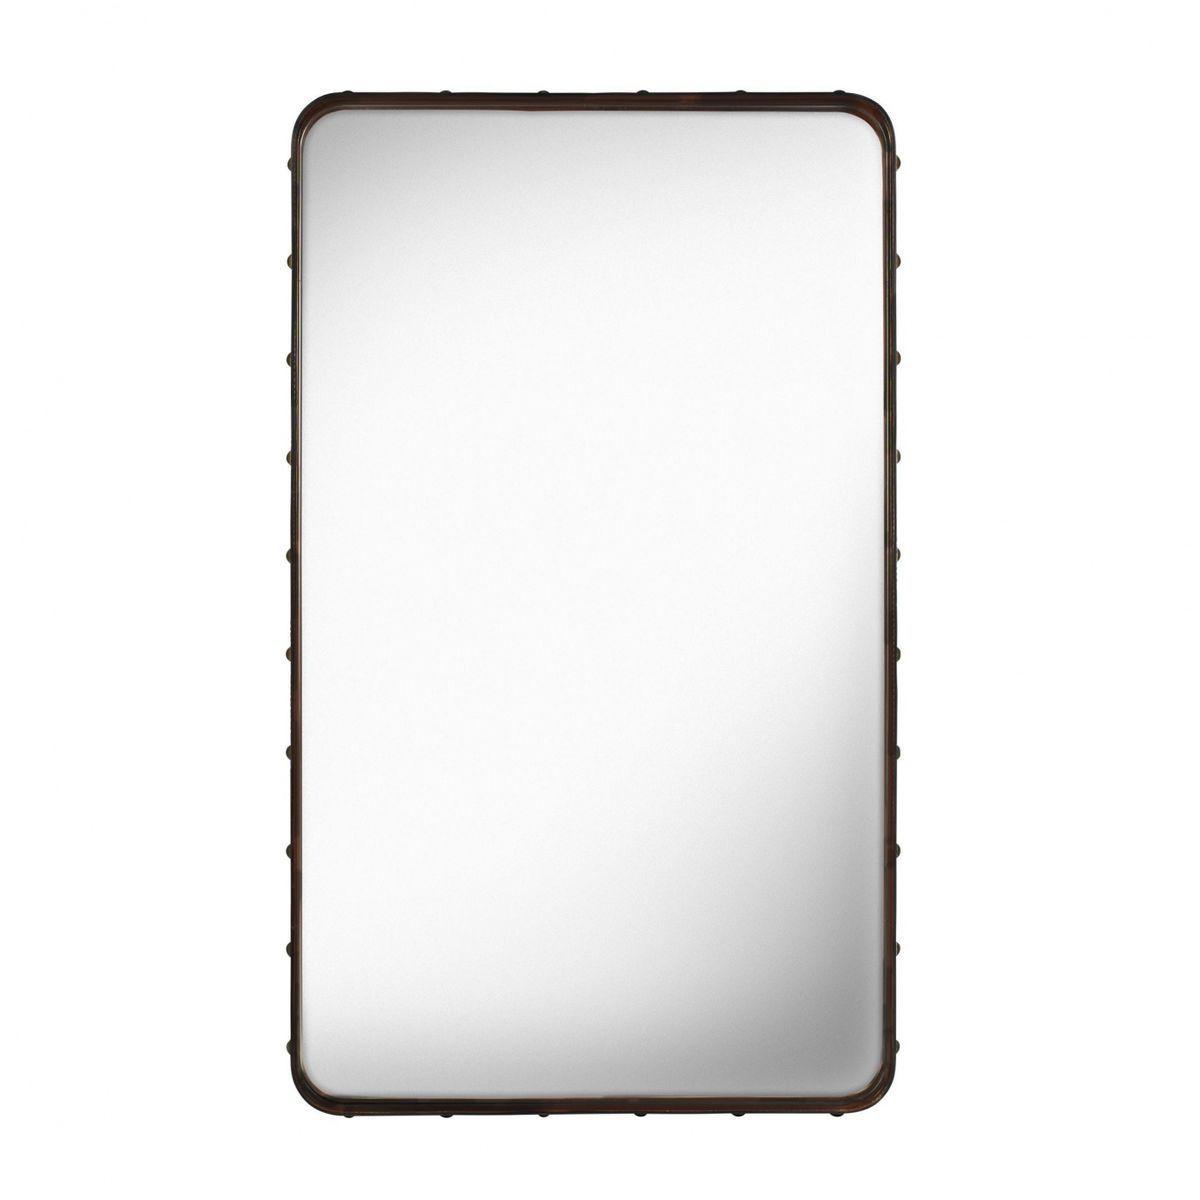 Adnet rectangular mirror gubi for Rectangle mirror